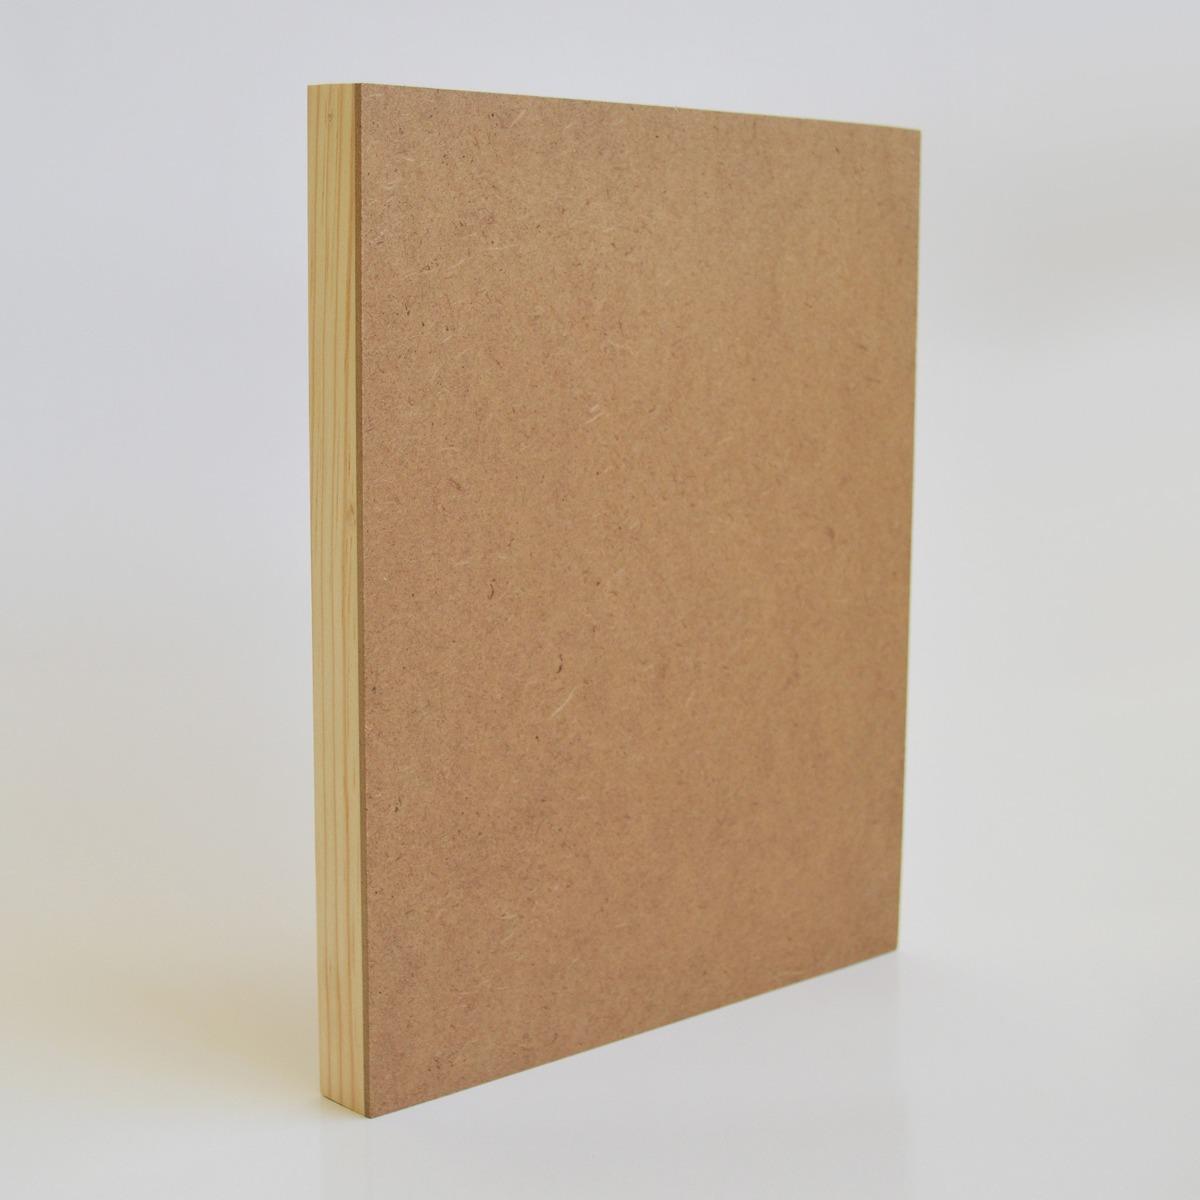 Bastidor de madera para pintura o fotograf a 25 x 30 cms - Pinturas de madera ...